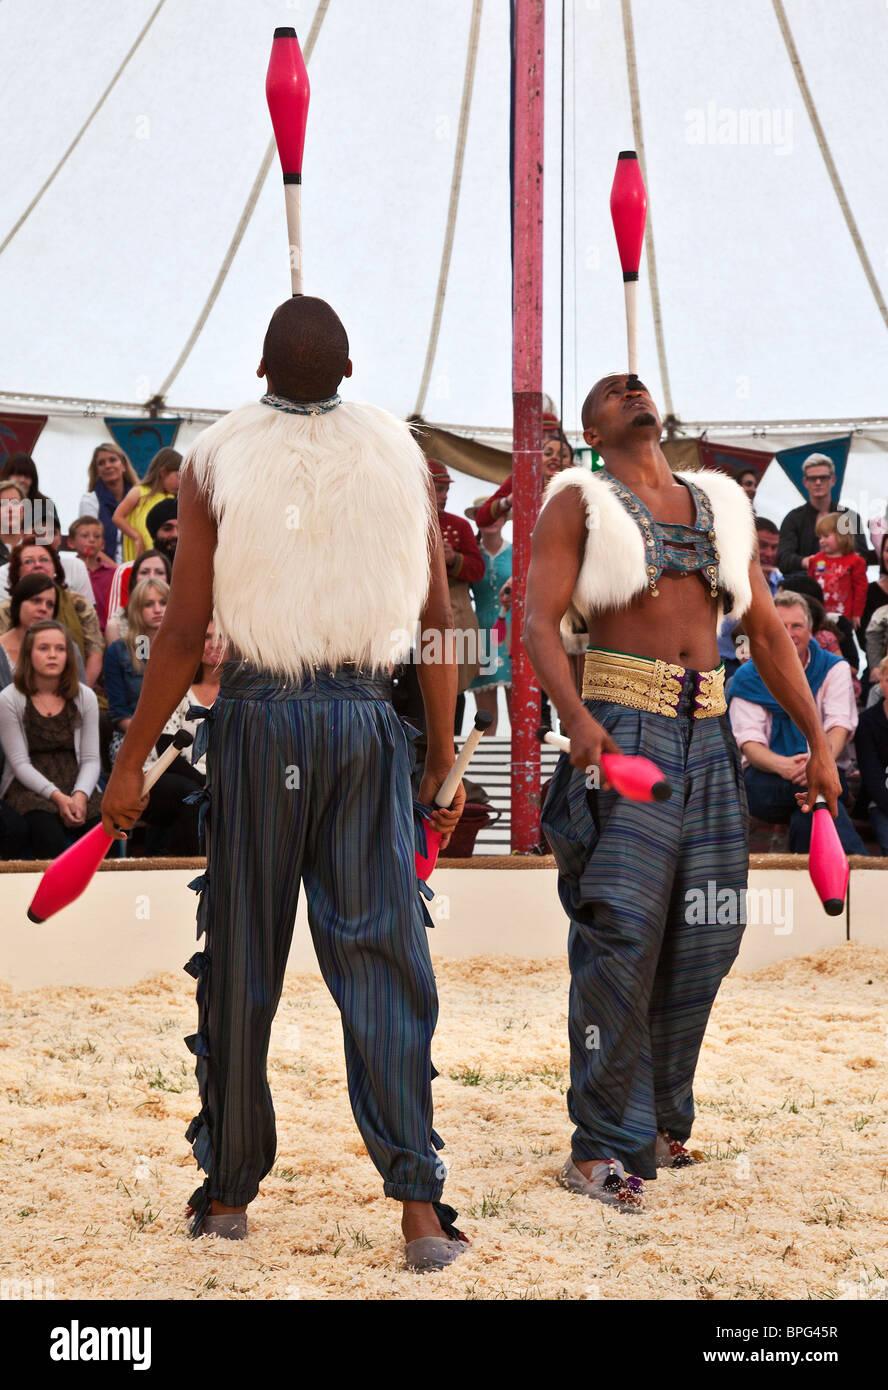 Jugglers Bichu and Bibi Tesfarmarium performing at Gifford's Circus Stock Photo